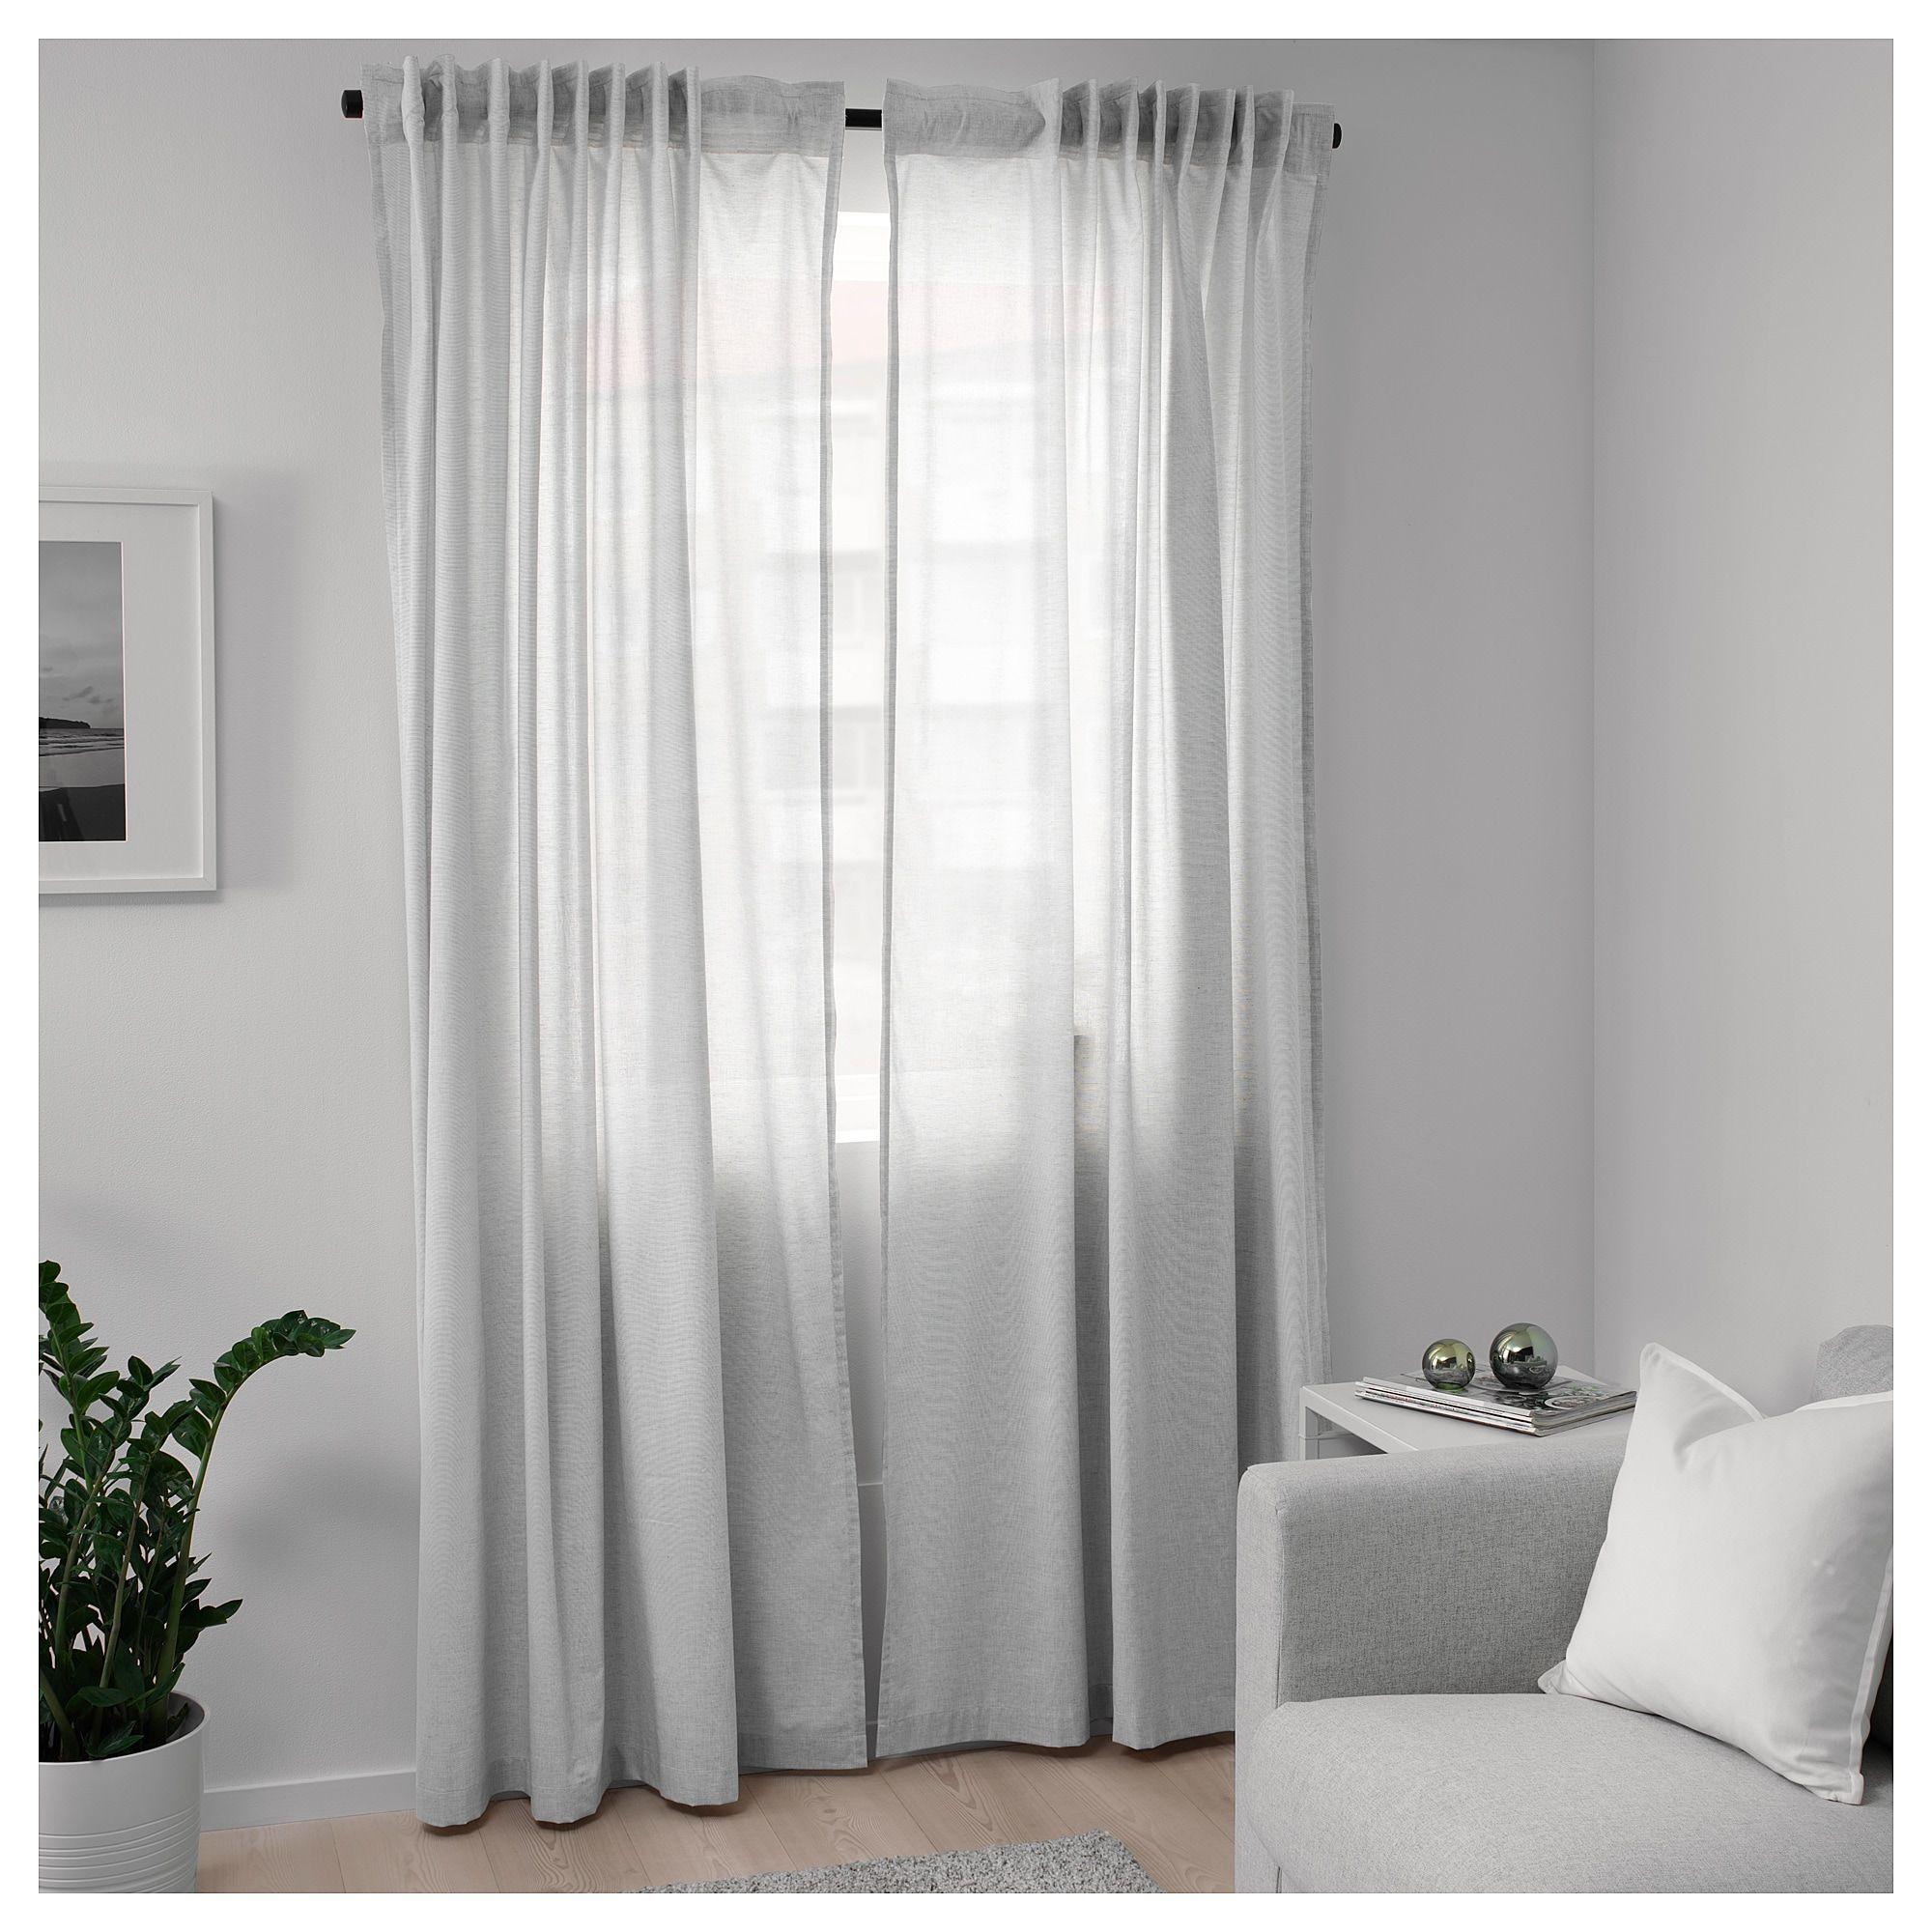 Hannalill Curtains 1 Pair Gray 57x98 Ikea Living Room Decor Curtains Light Green Curtains Curtains